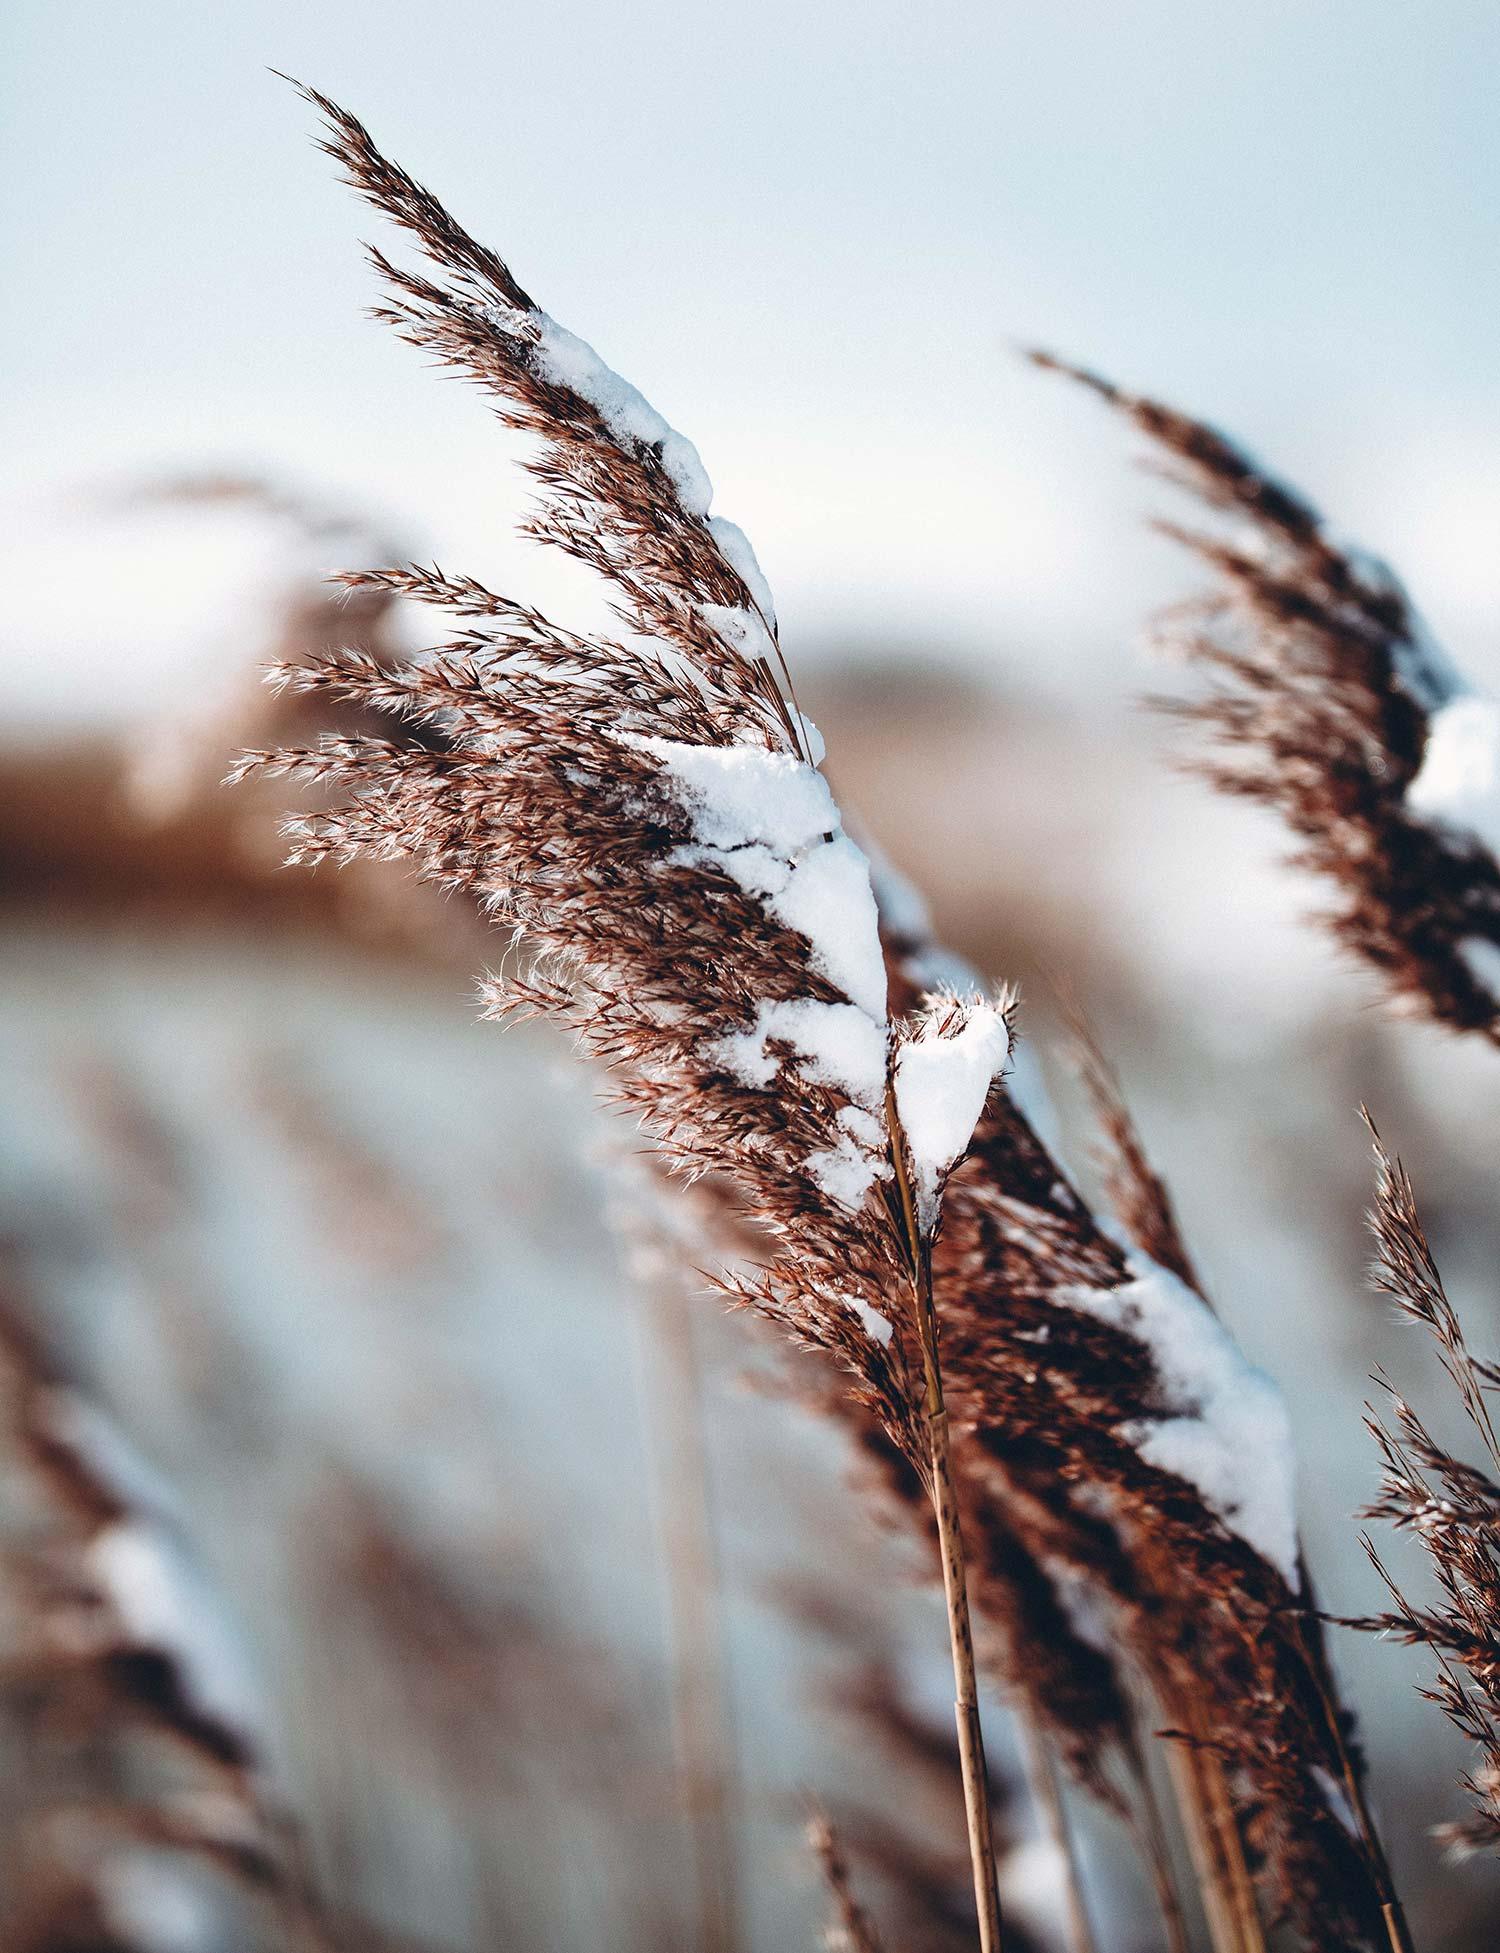 vinter-tradgardsdesign